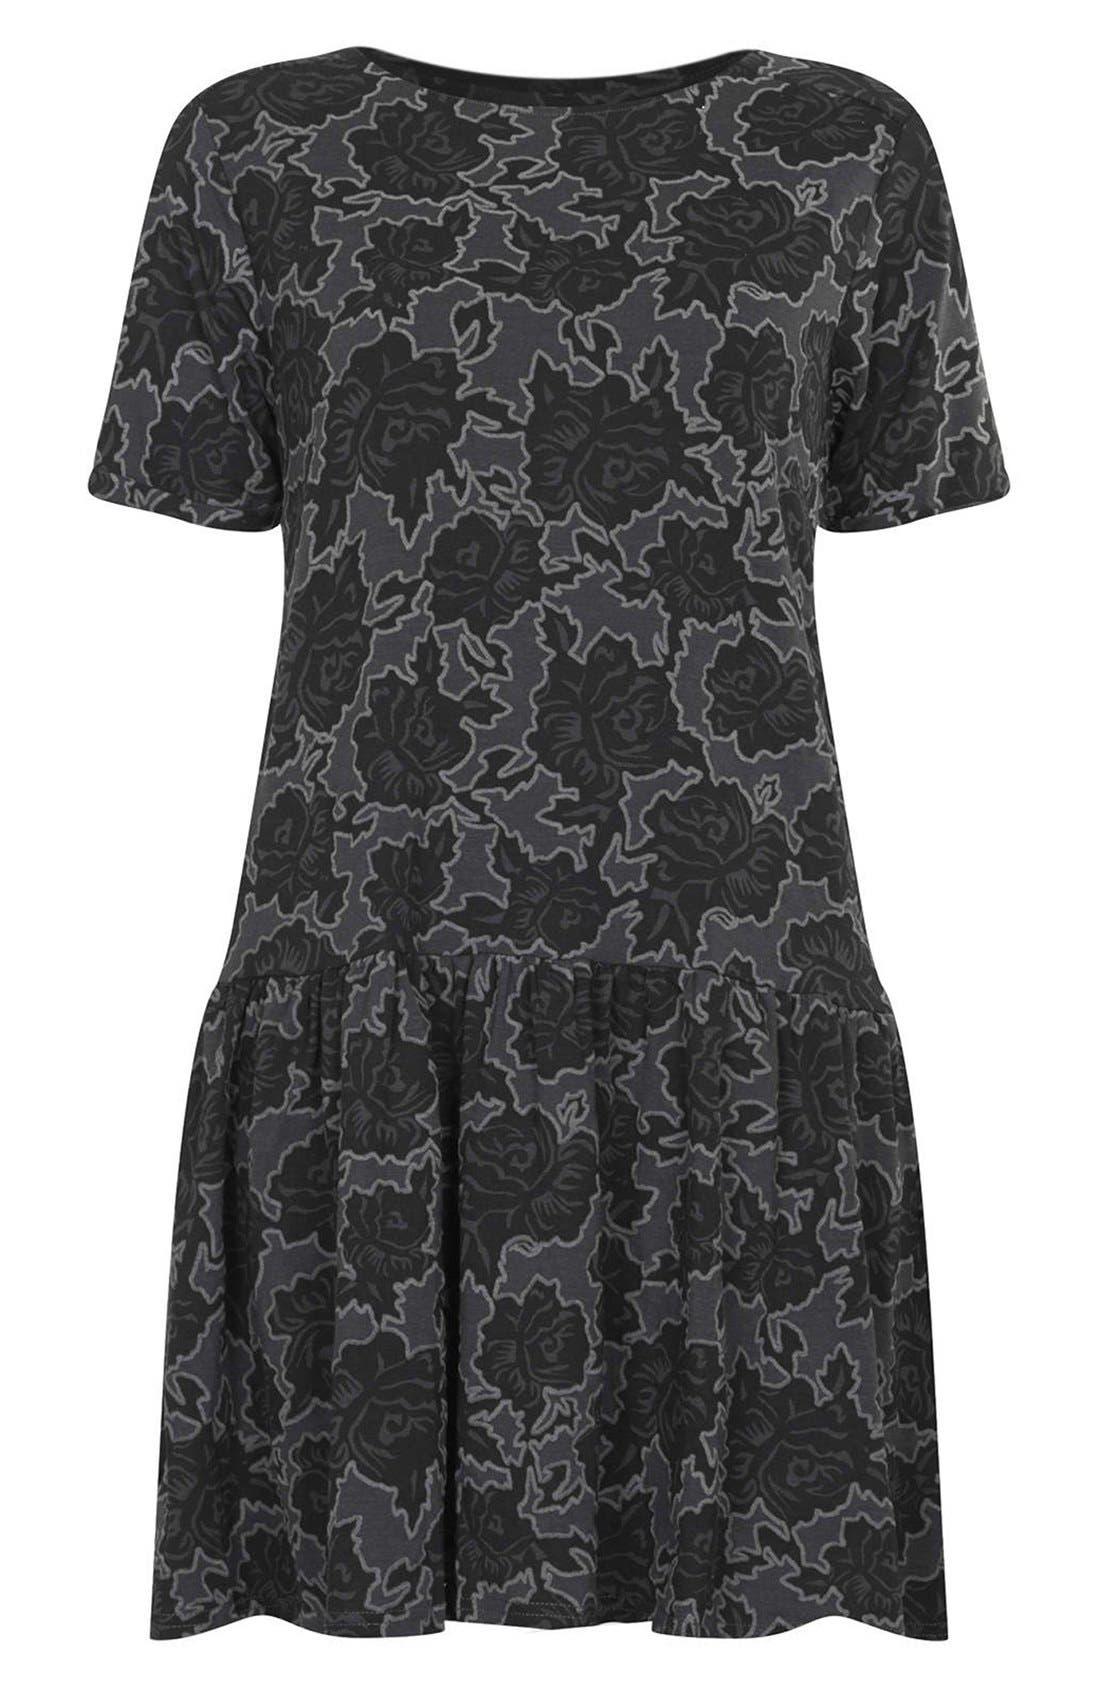 Alternate Image 3  - Topshop Textured Rose Tunic Dress